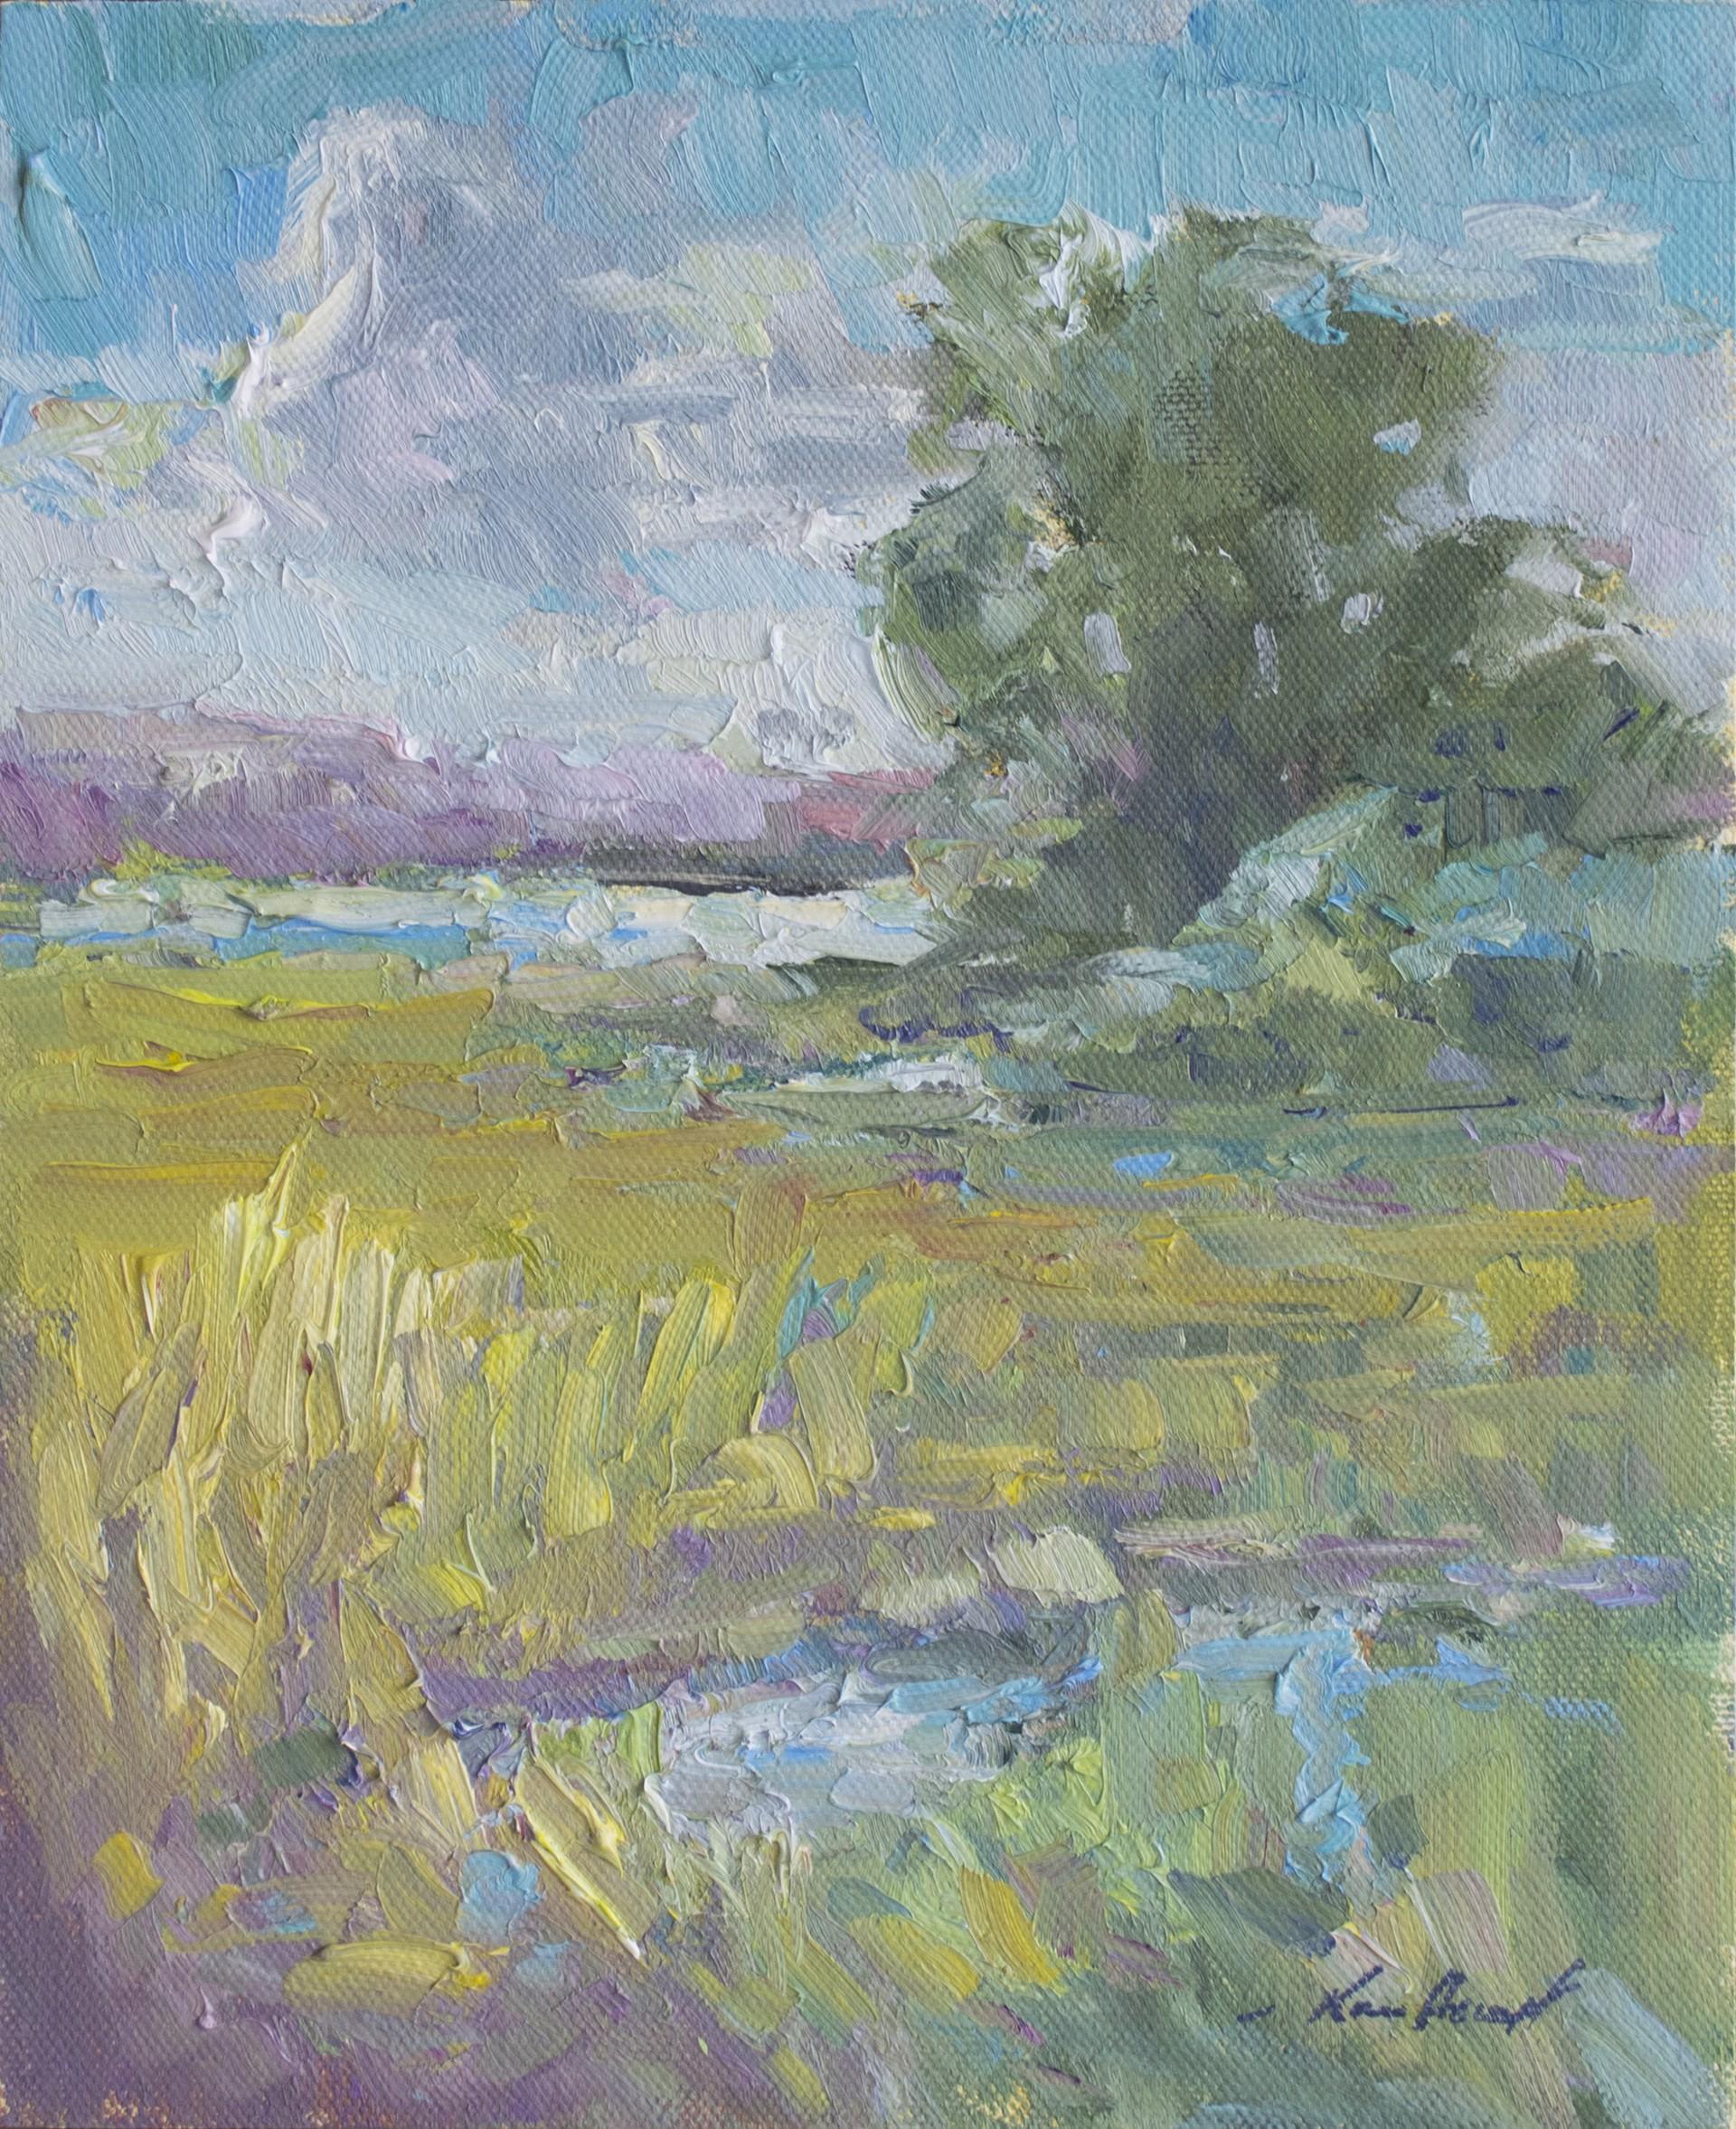 July Day on the Marsh by Karen Hewitt Hagan